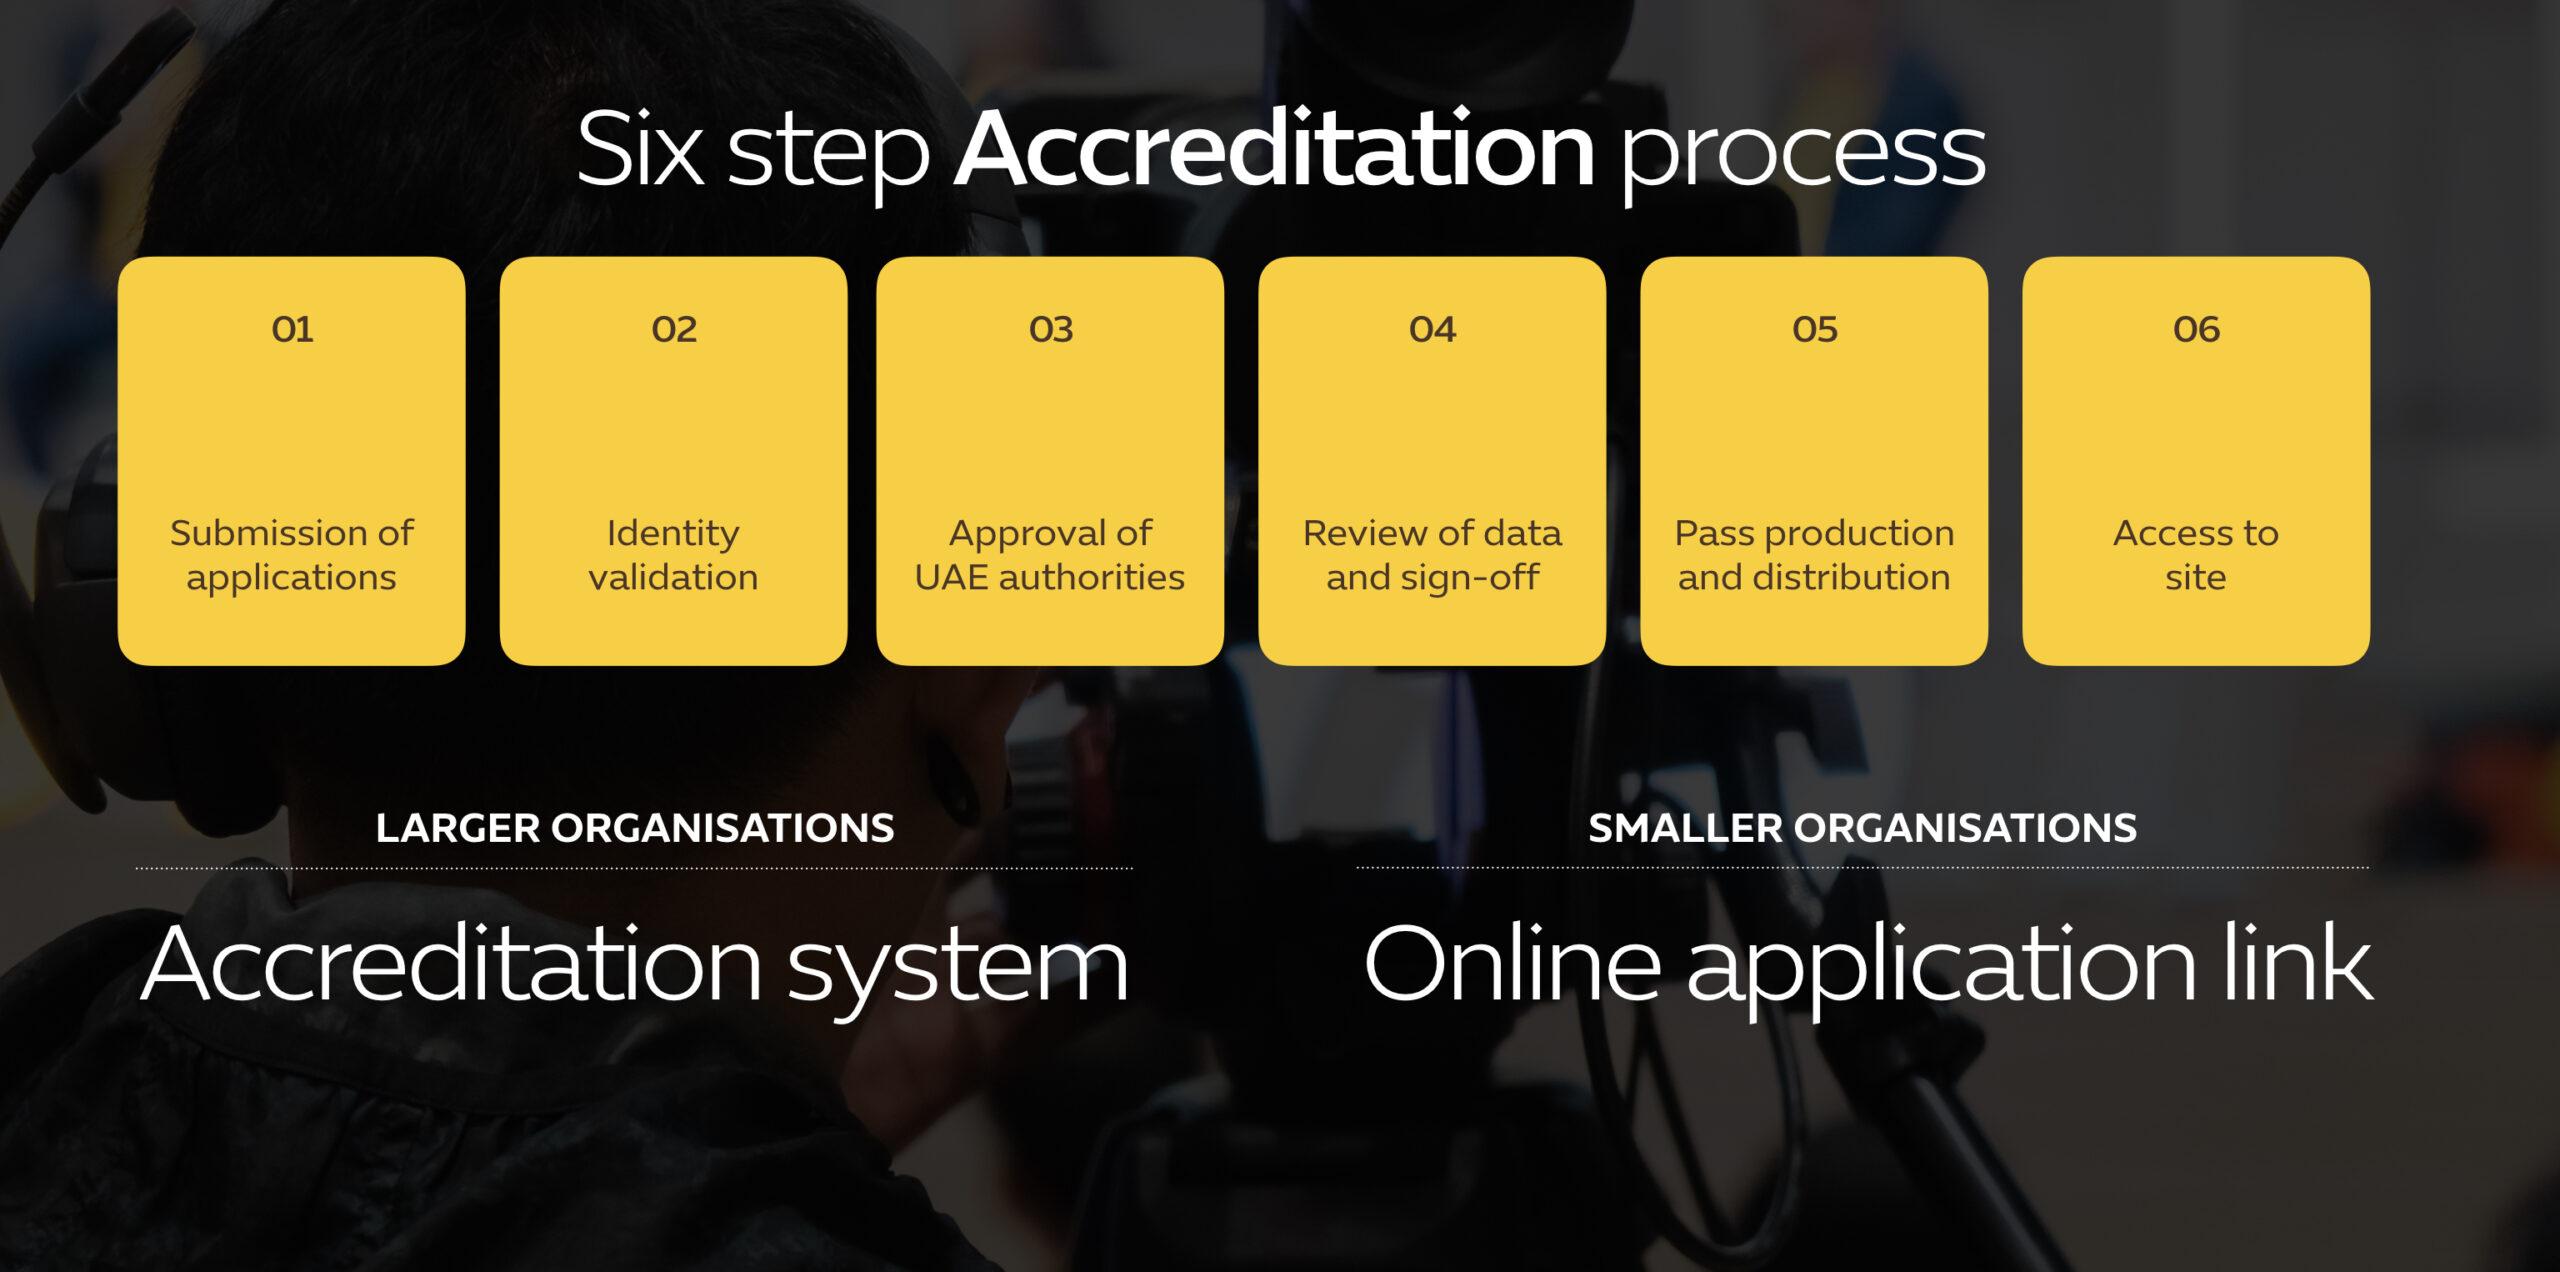 06-Accreditation-Permits-and-Visas.026